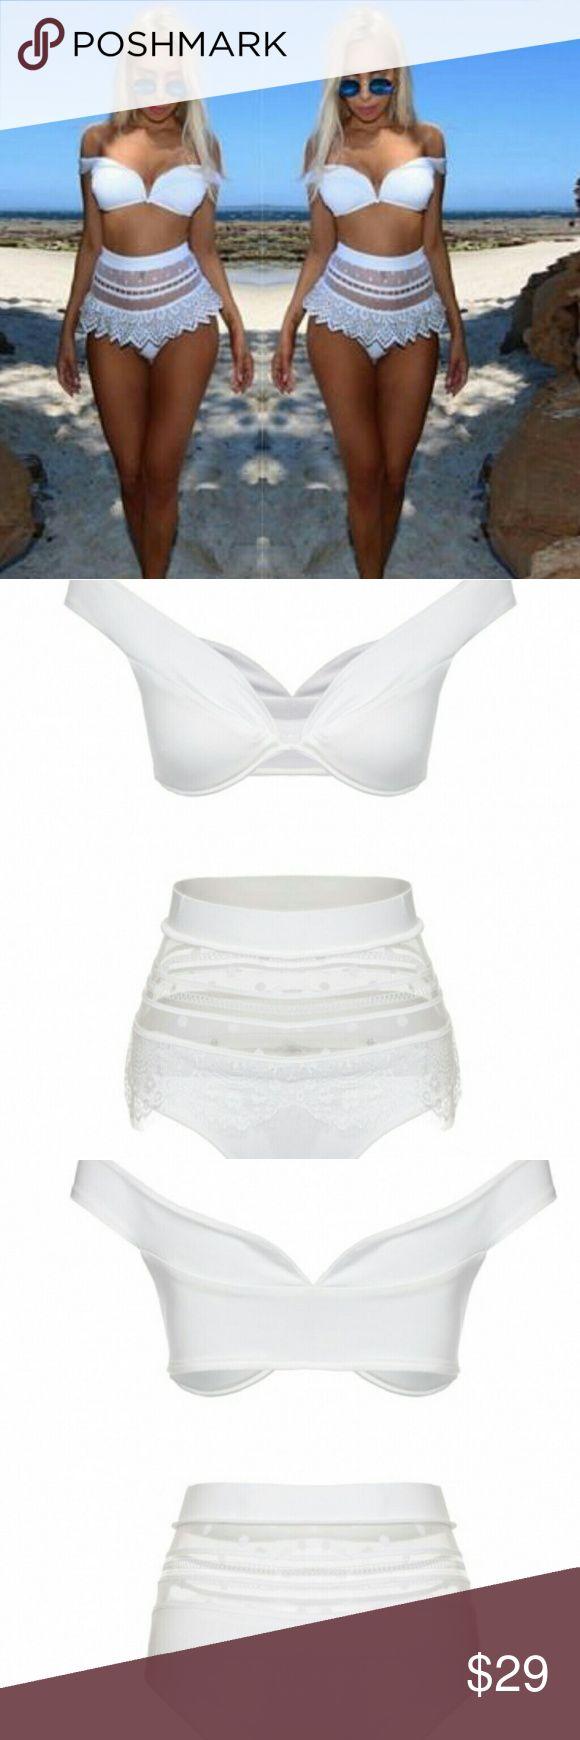 Off shoulder bikini Gorgeous white high waist bikini. This suit is adorable and sexy. Great for summer! Swim Bikinis